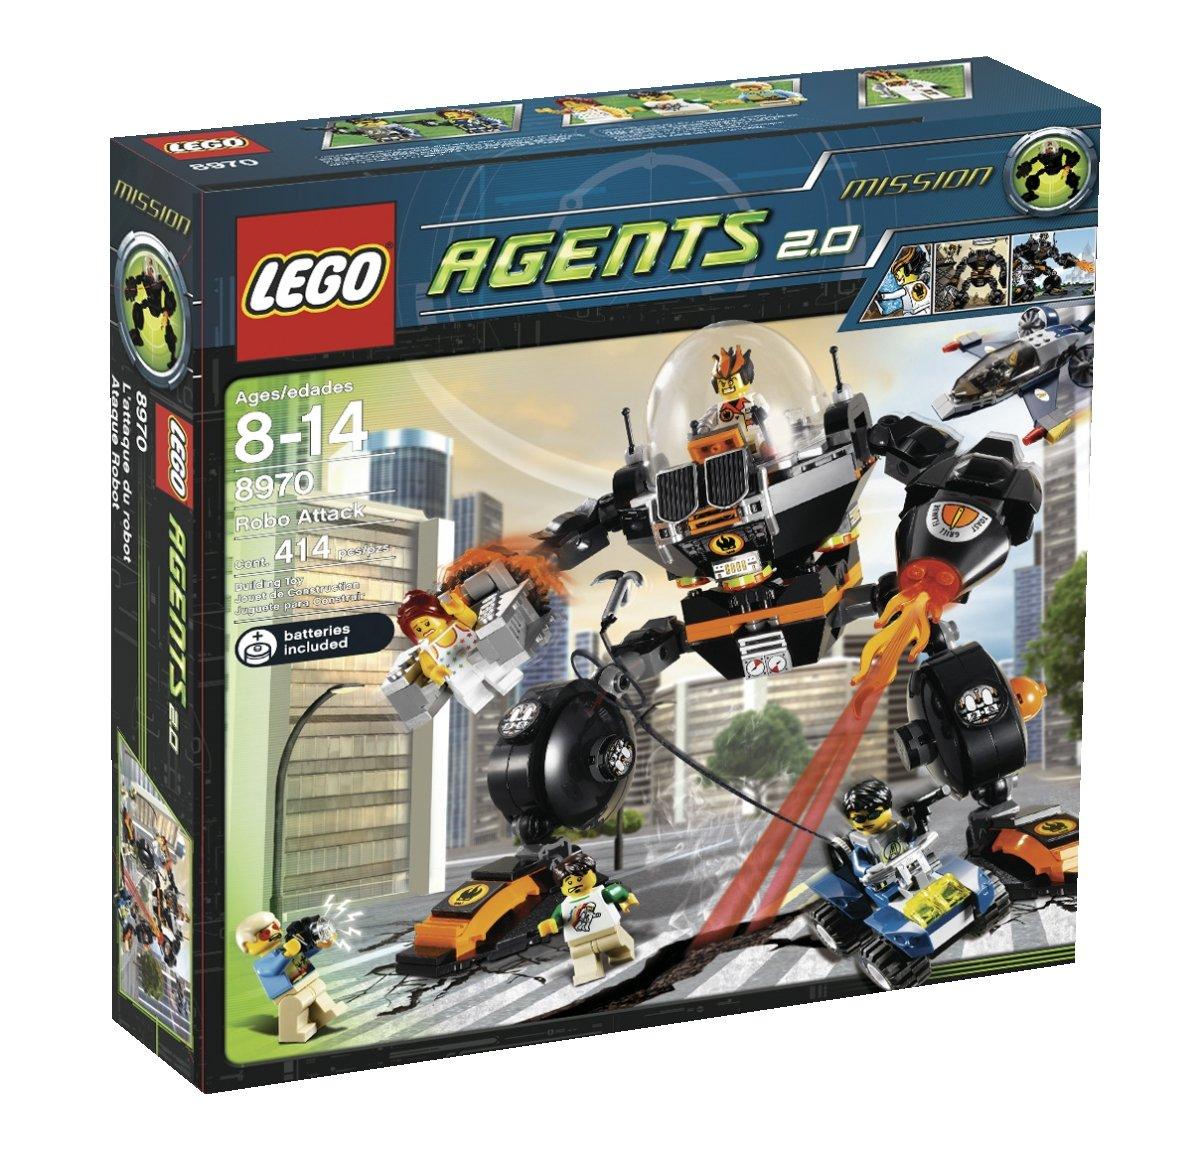 LEGO Agents Robo Attack (8970) jetzt bestellen